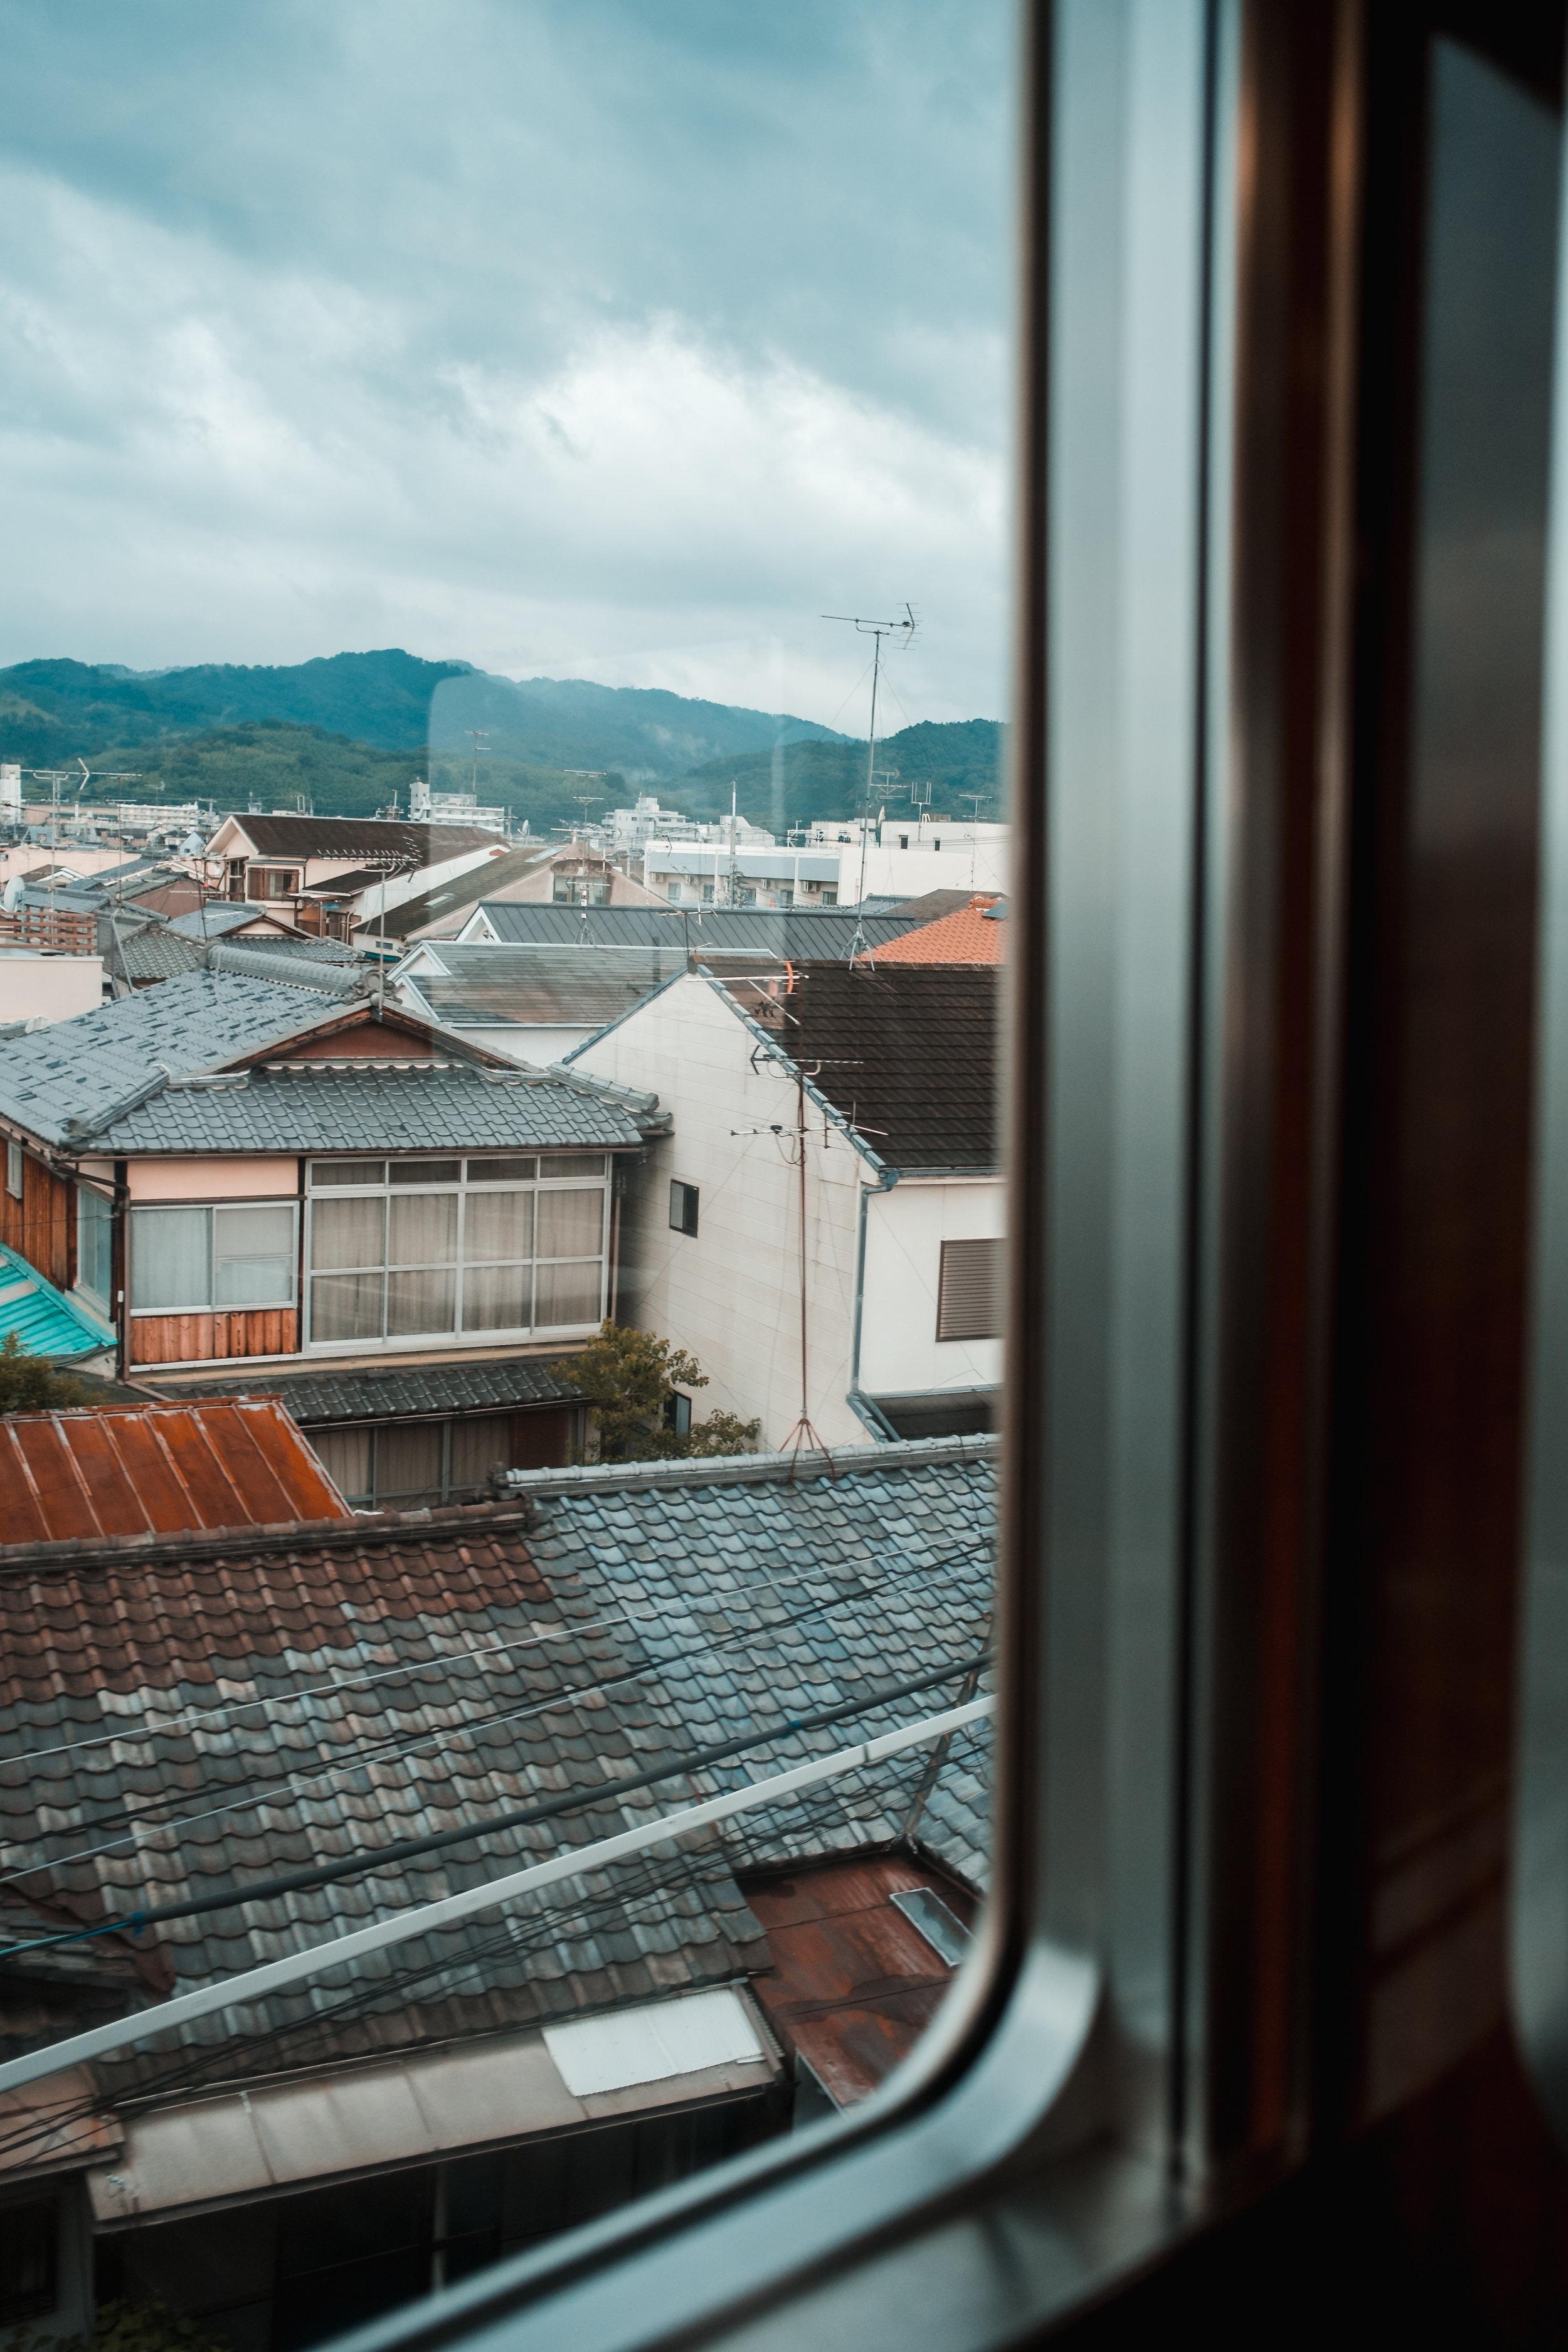 KyotoJapan_2018_AdamDillon_DSCF9724.jpg